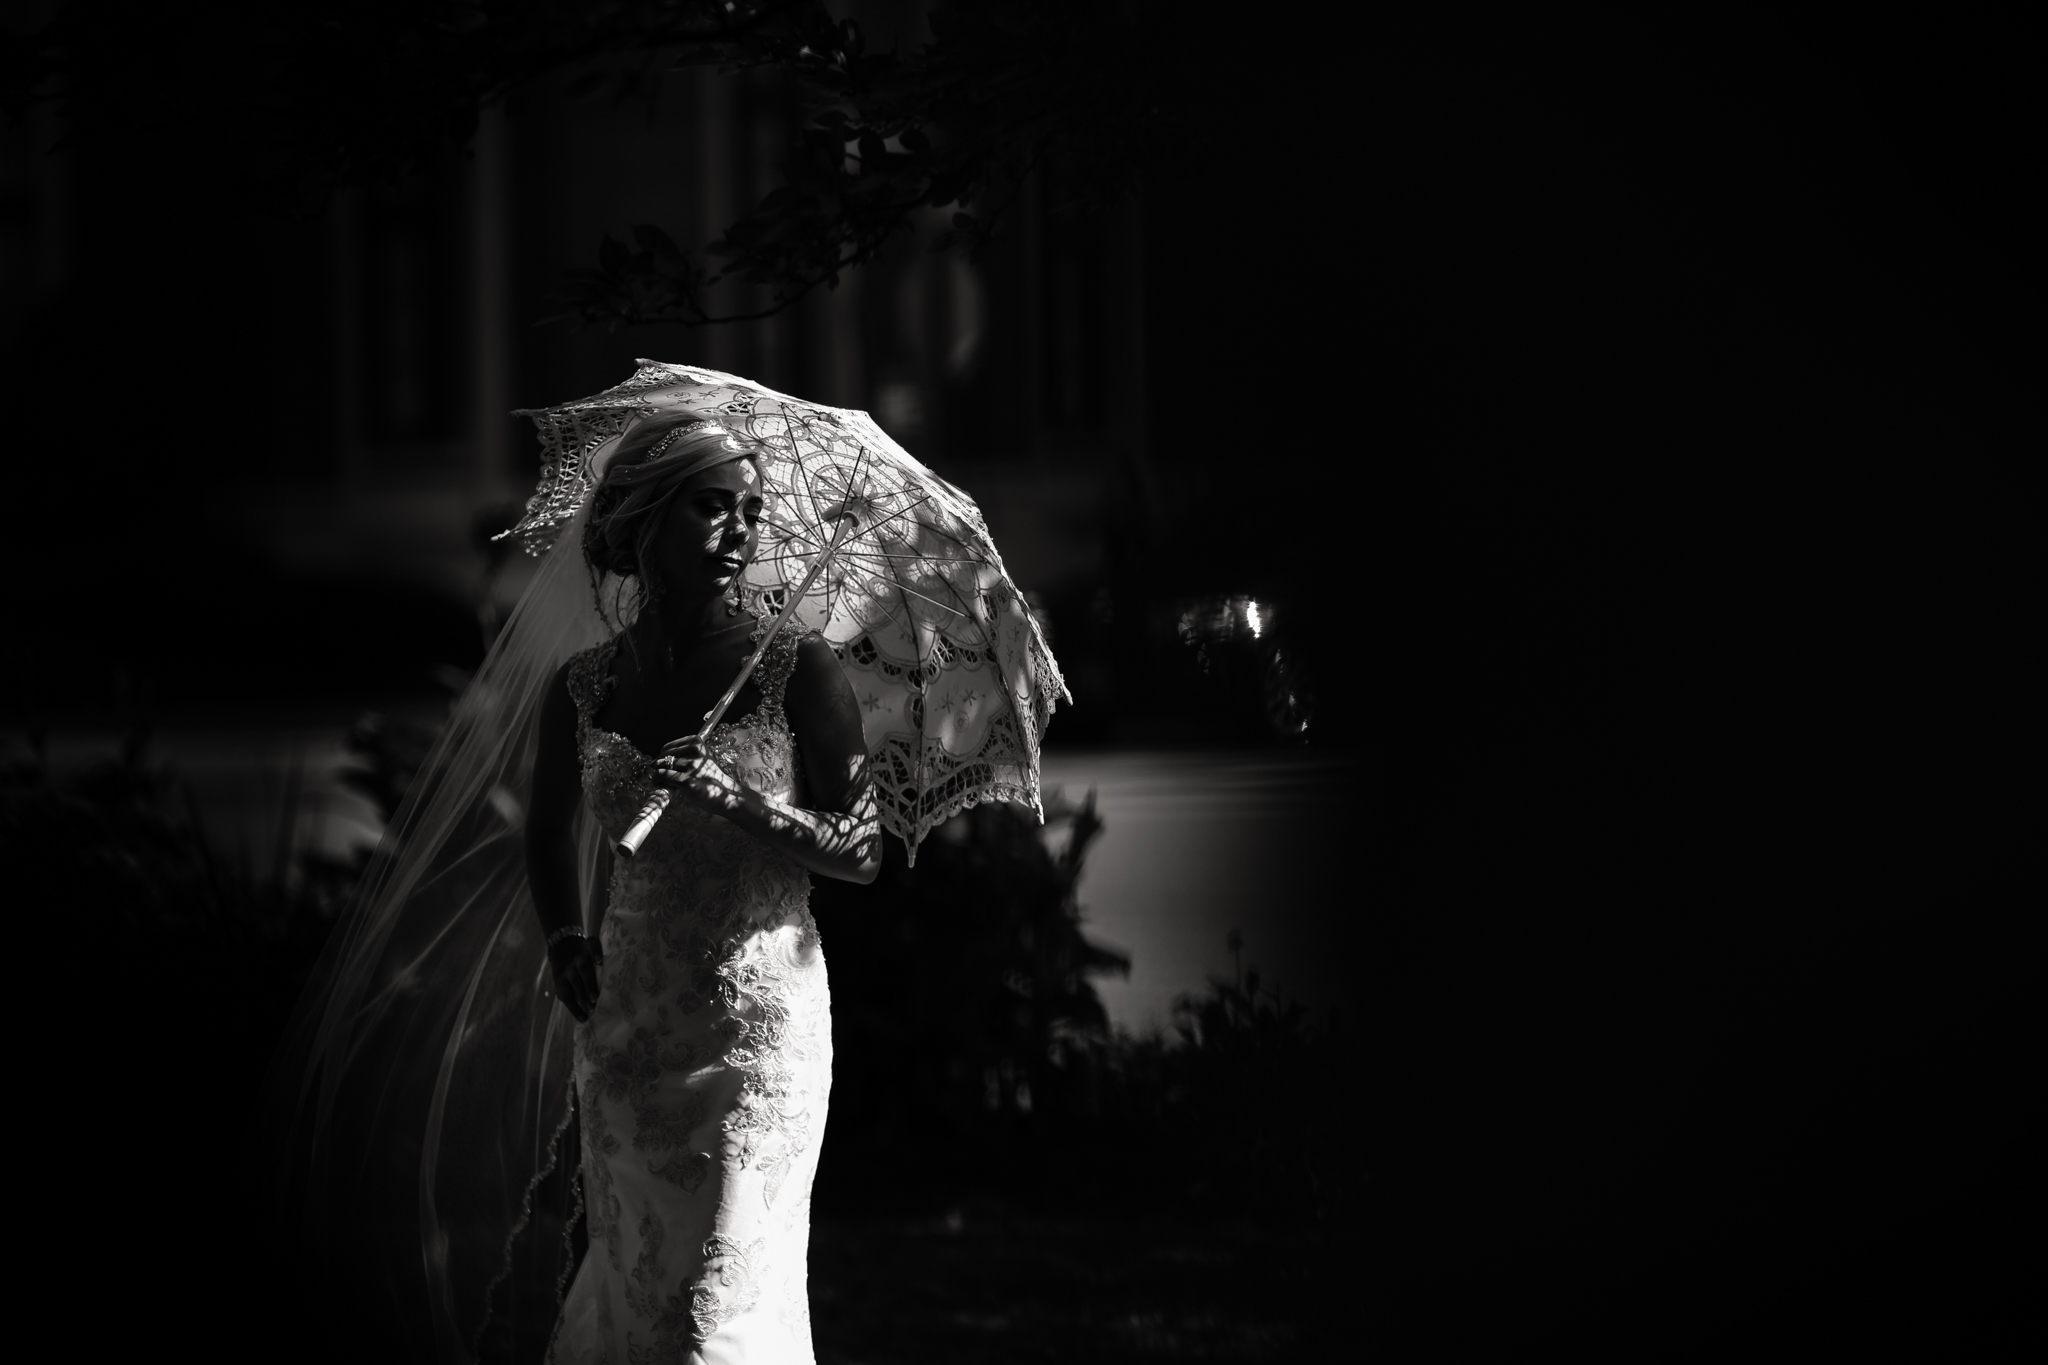 Statler-City-Buffalo-wedding-photographer- 0441bw.jpg